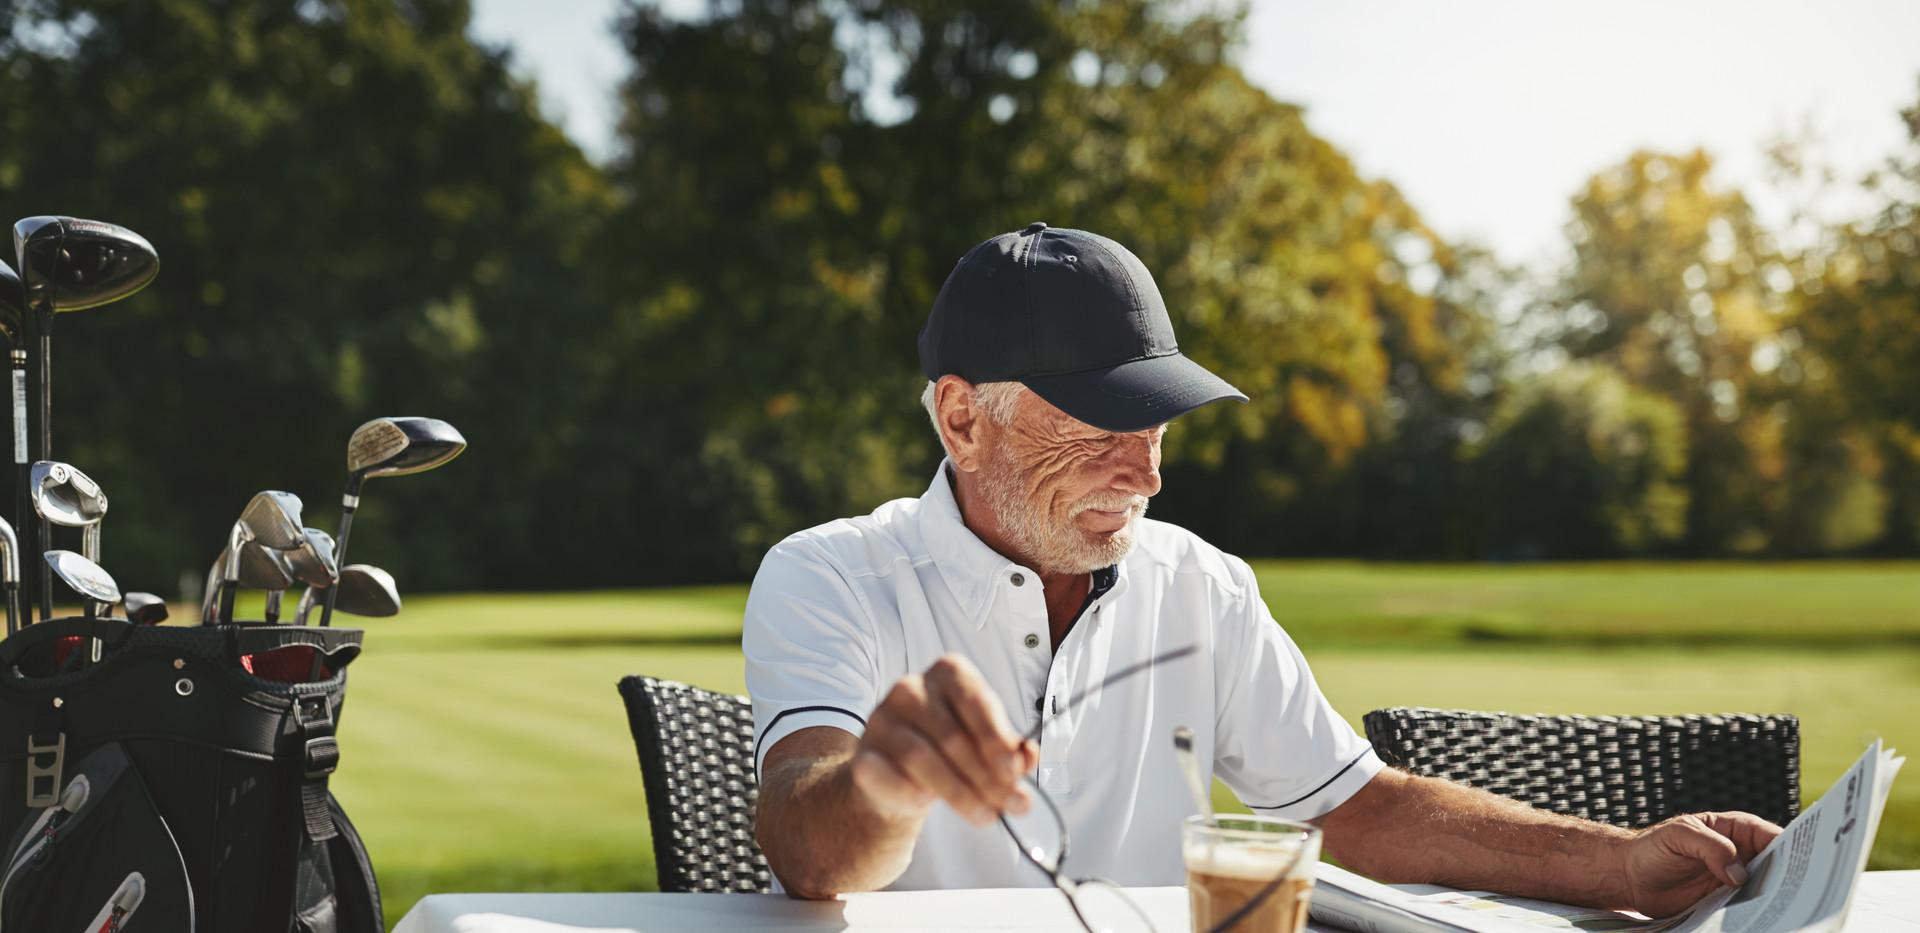 Smiling senior man relaxing at his golf